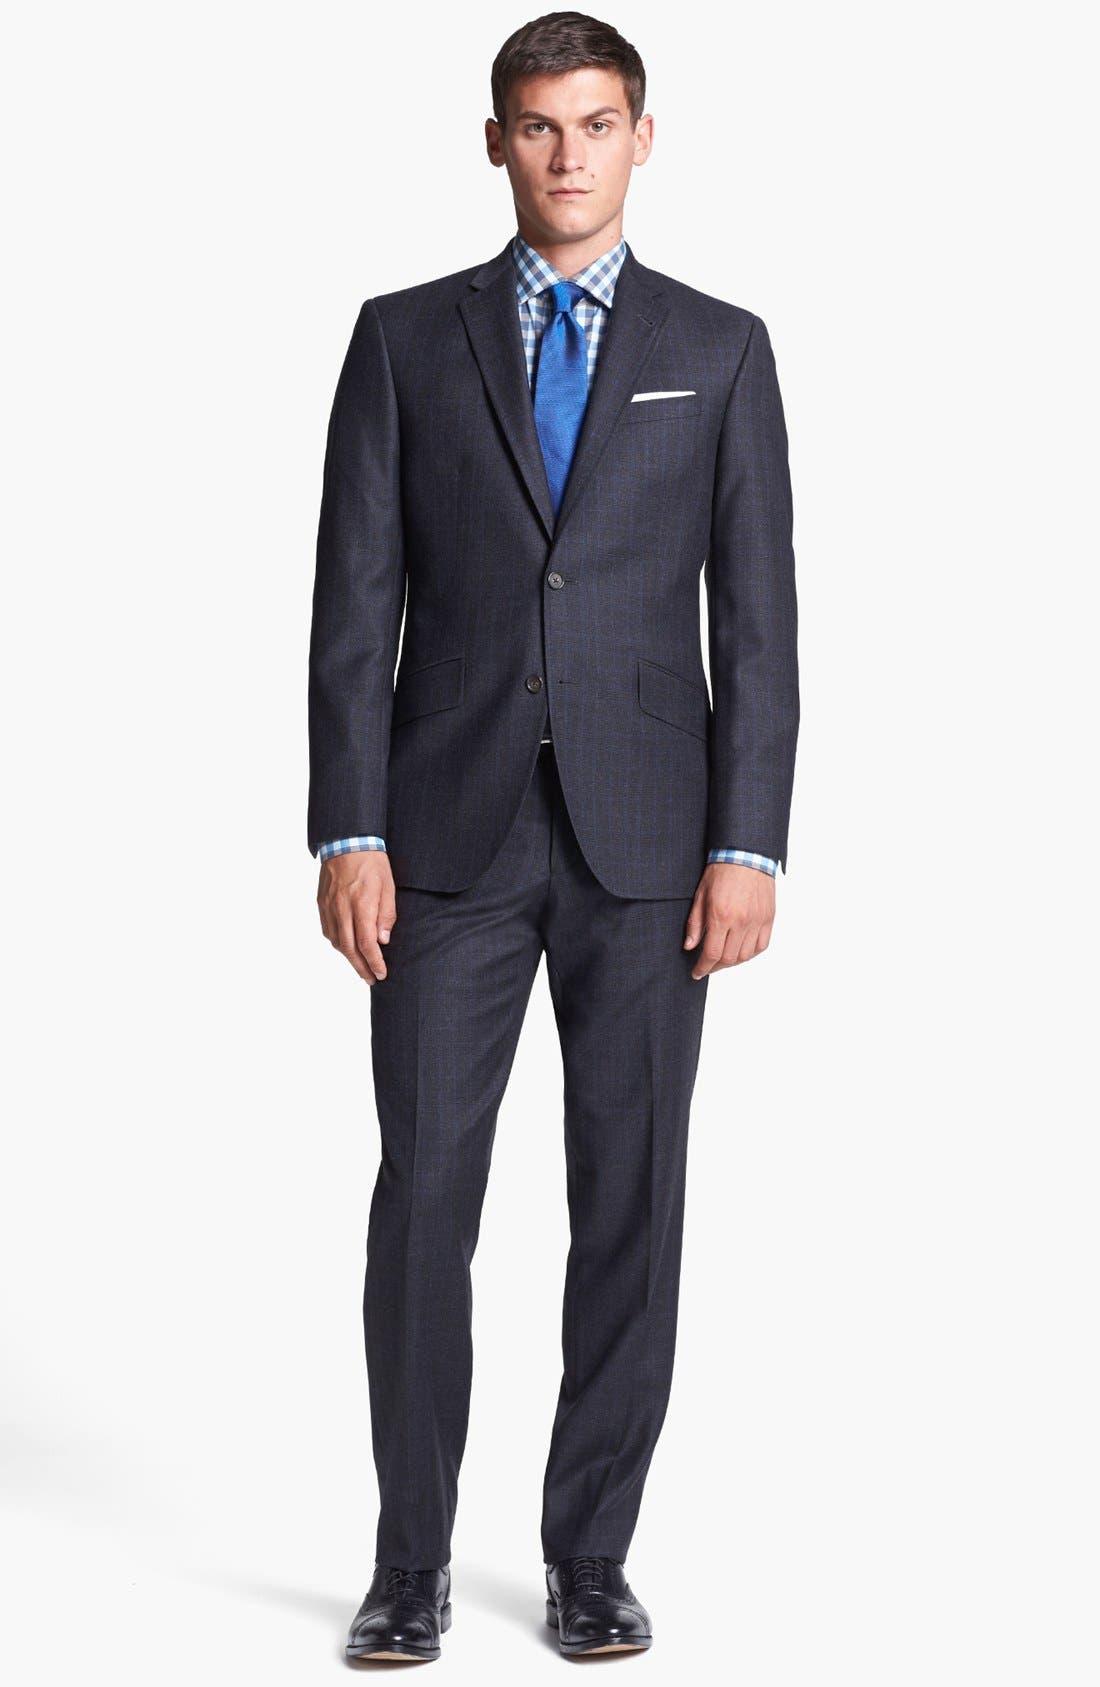 Main Image - Ted Baker London Suit & Calibrate Dress Shirt